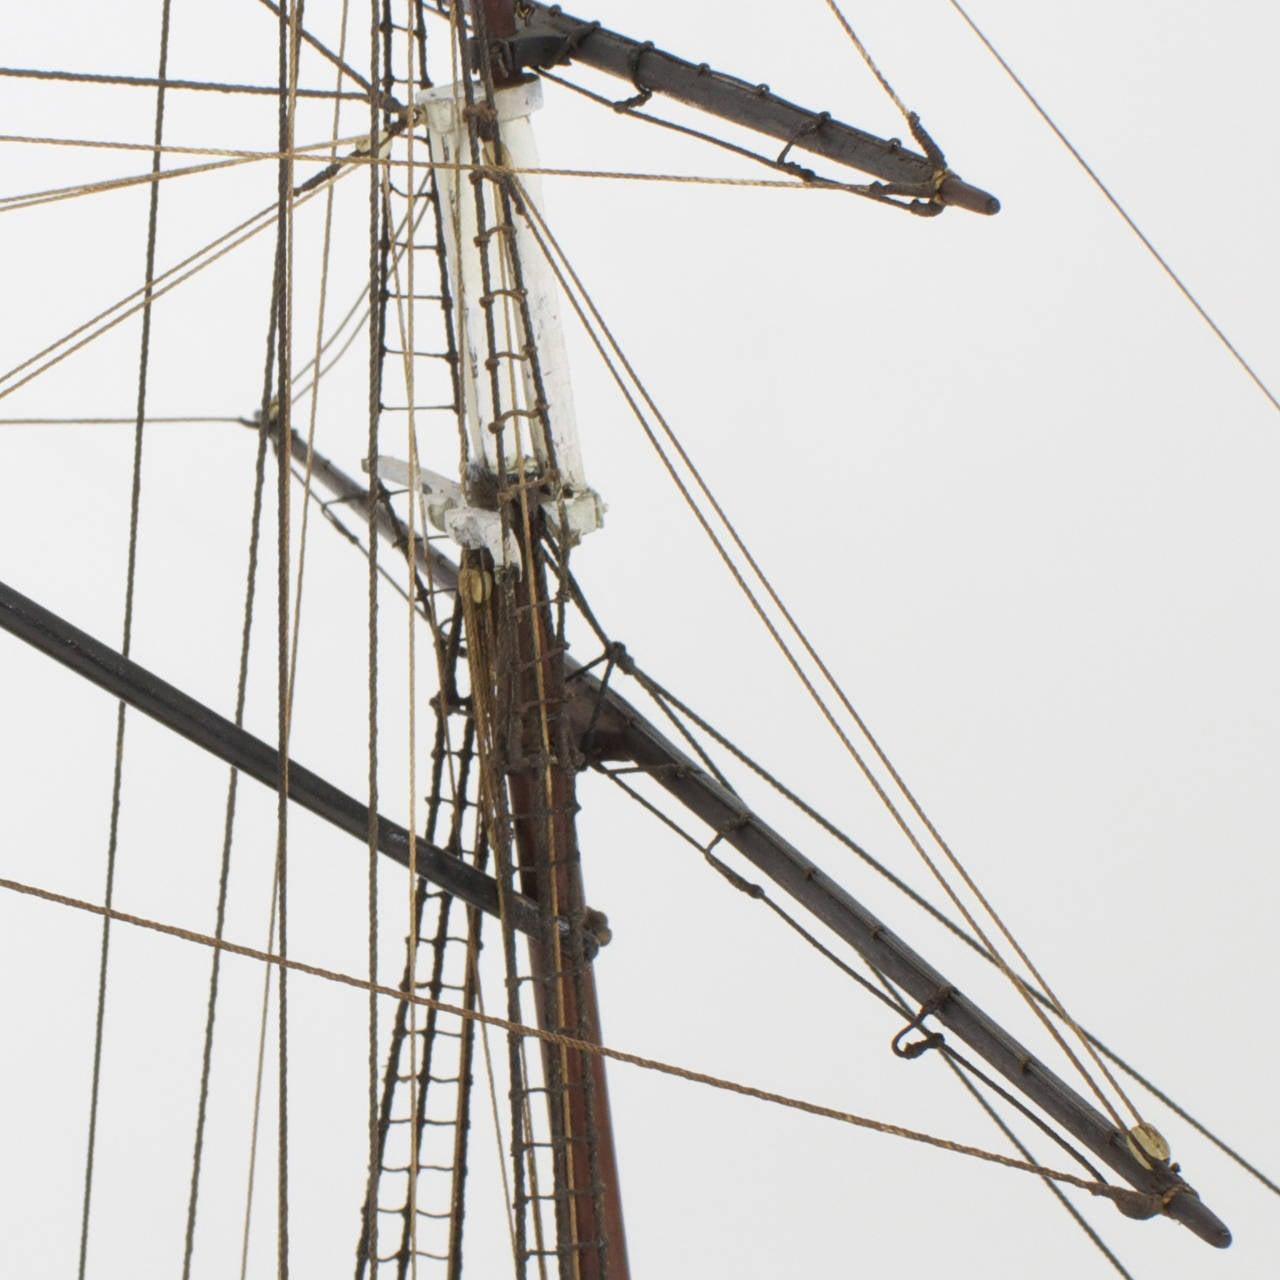 Mahogany Schooner Ship or Boat Model For Sale 1